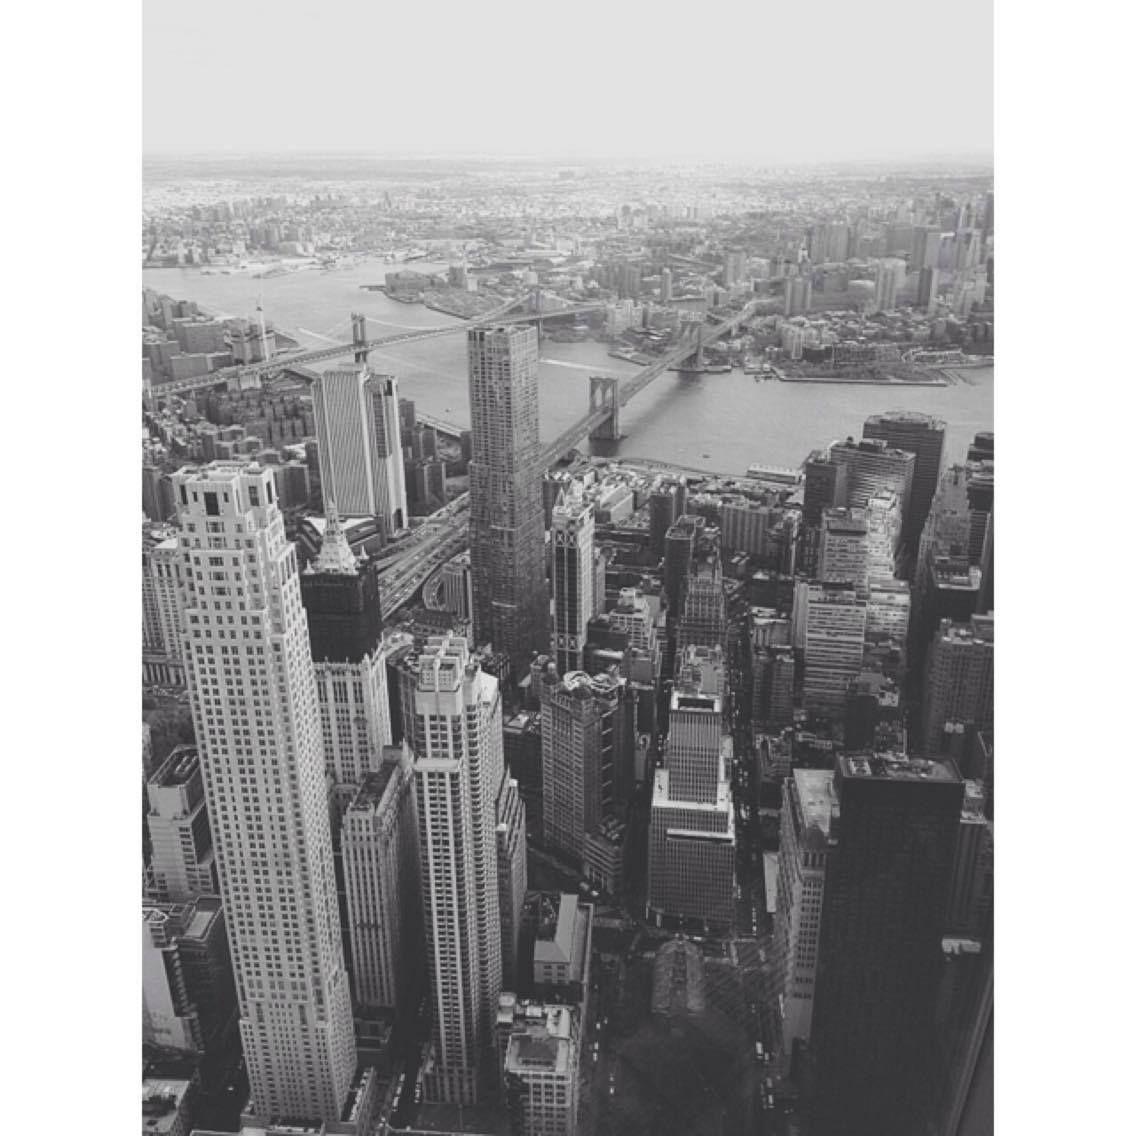 New York City Photo by Katey Kate